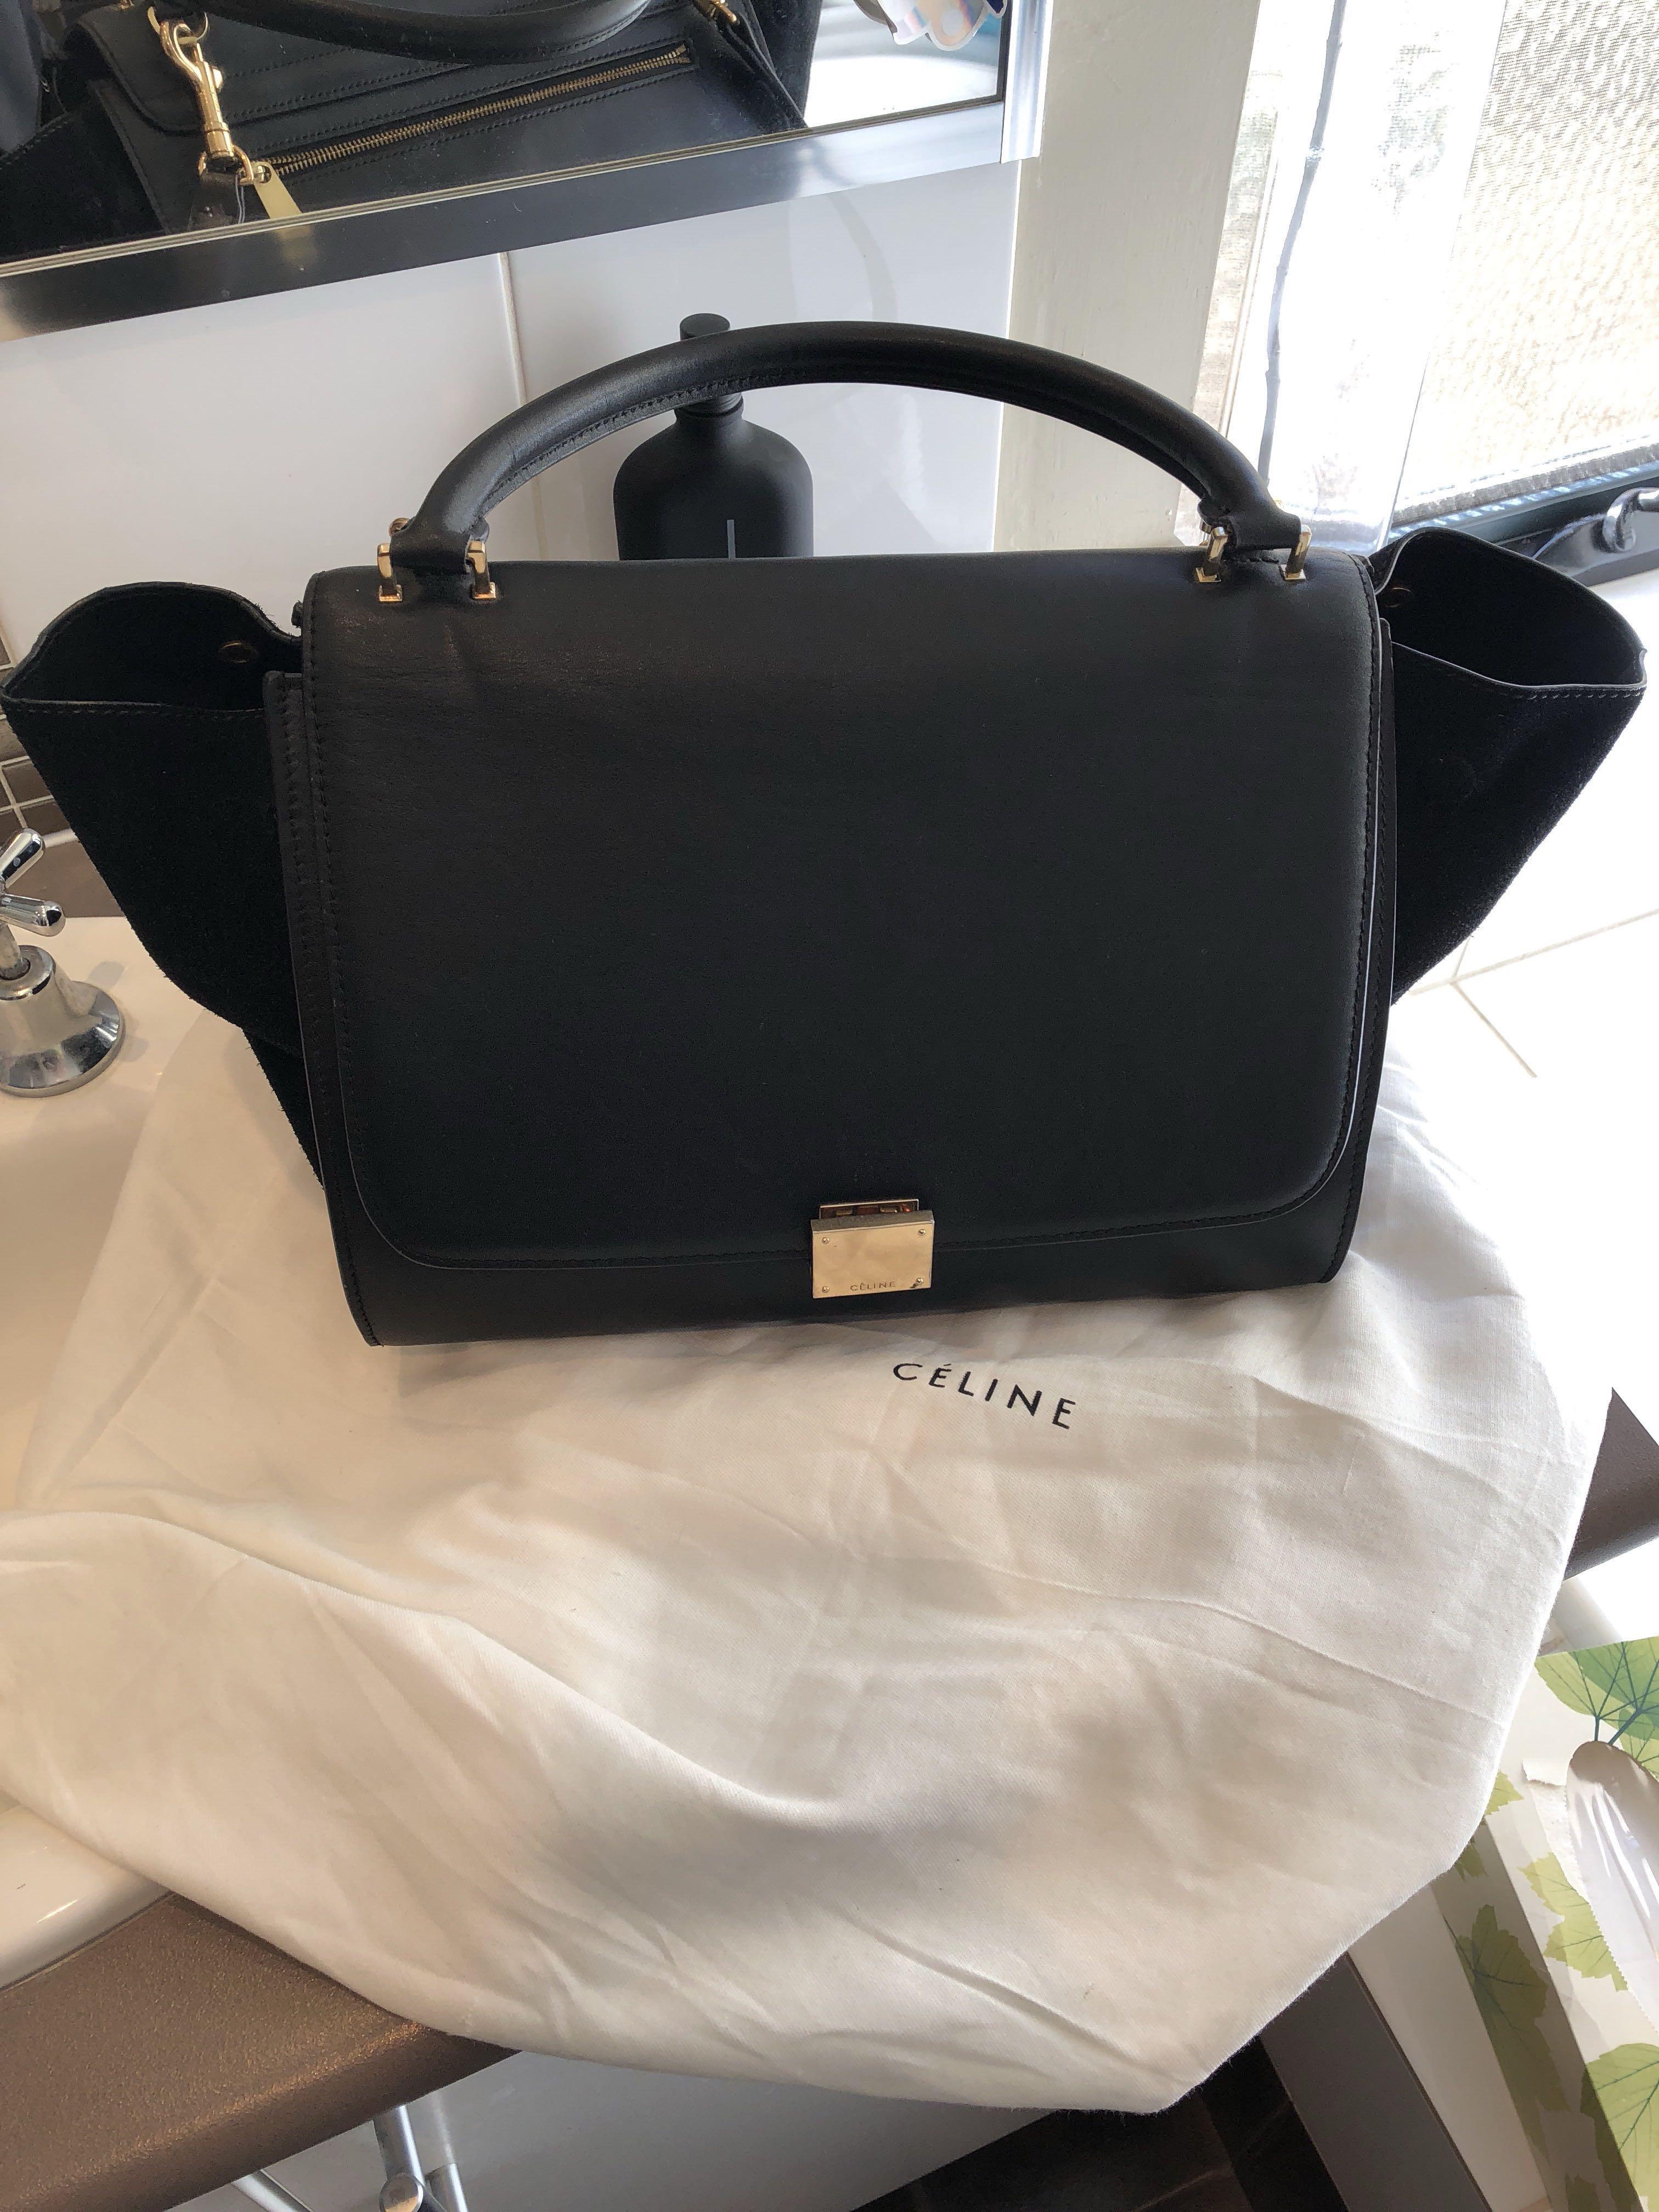 74145d3e6e3a Celine black leather large trapeze bag with gold hardware